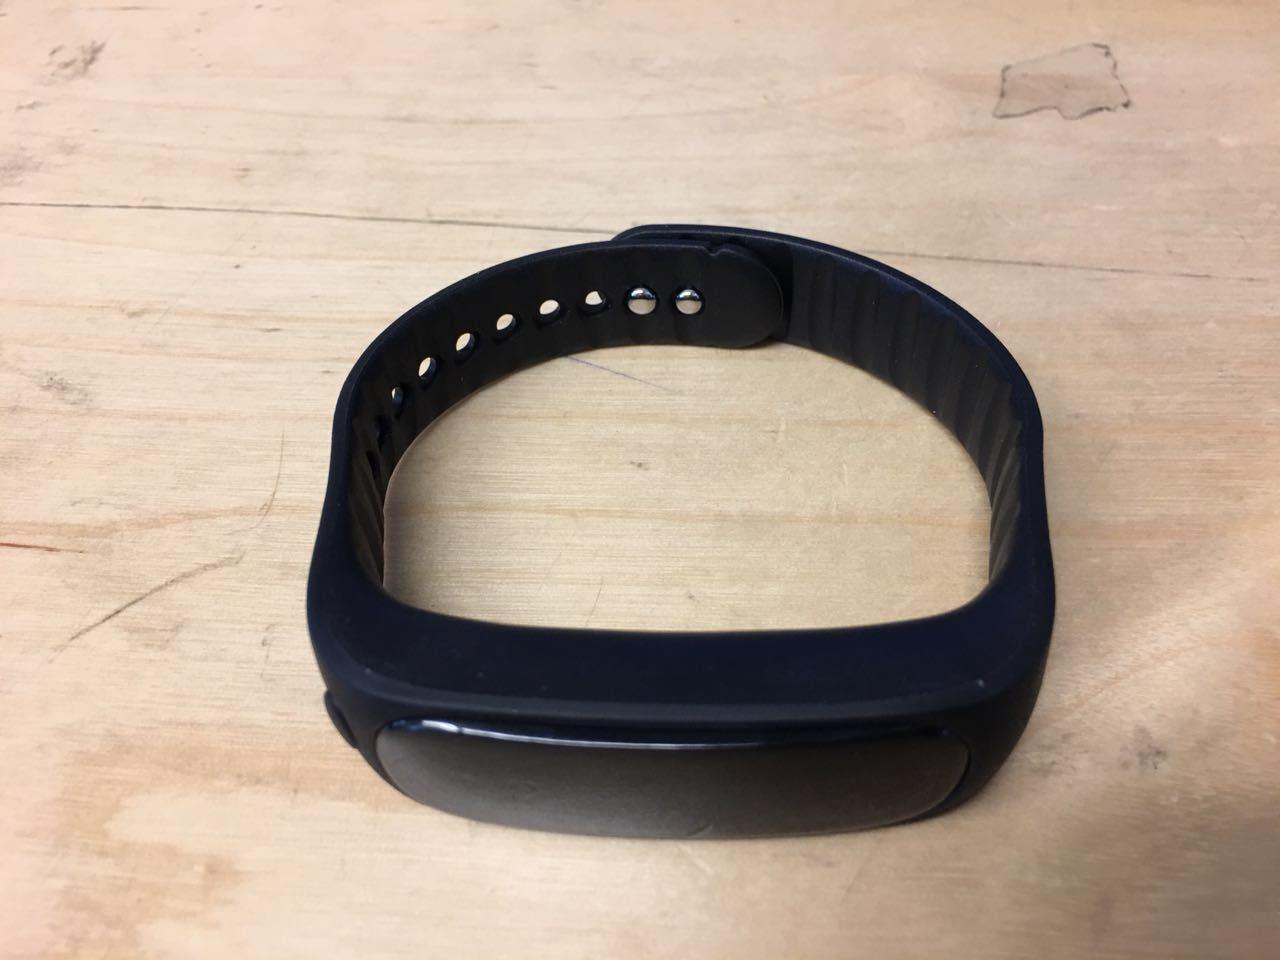 New Smart Wristband Watch Pedometer Distance Calories Sleep Monitoring Fitness Technology